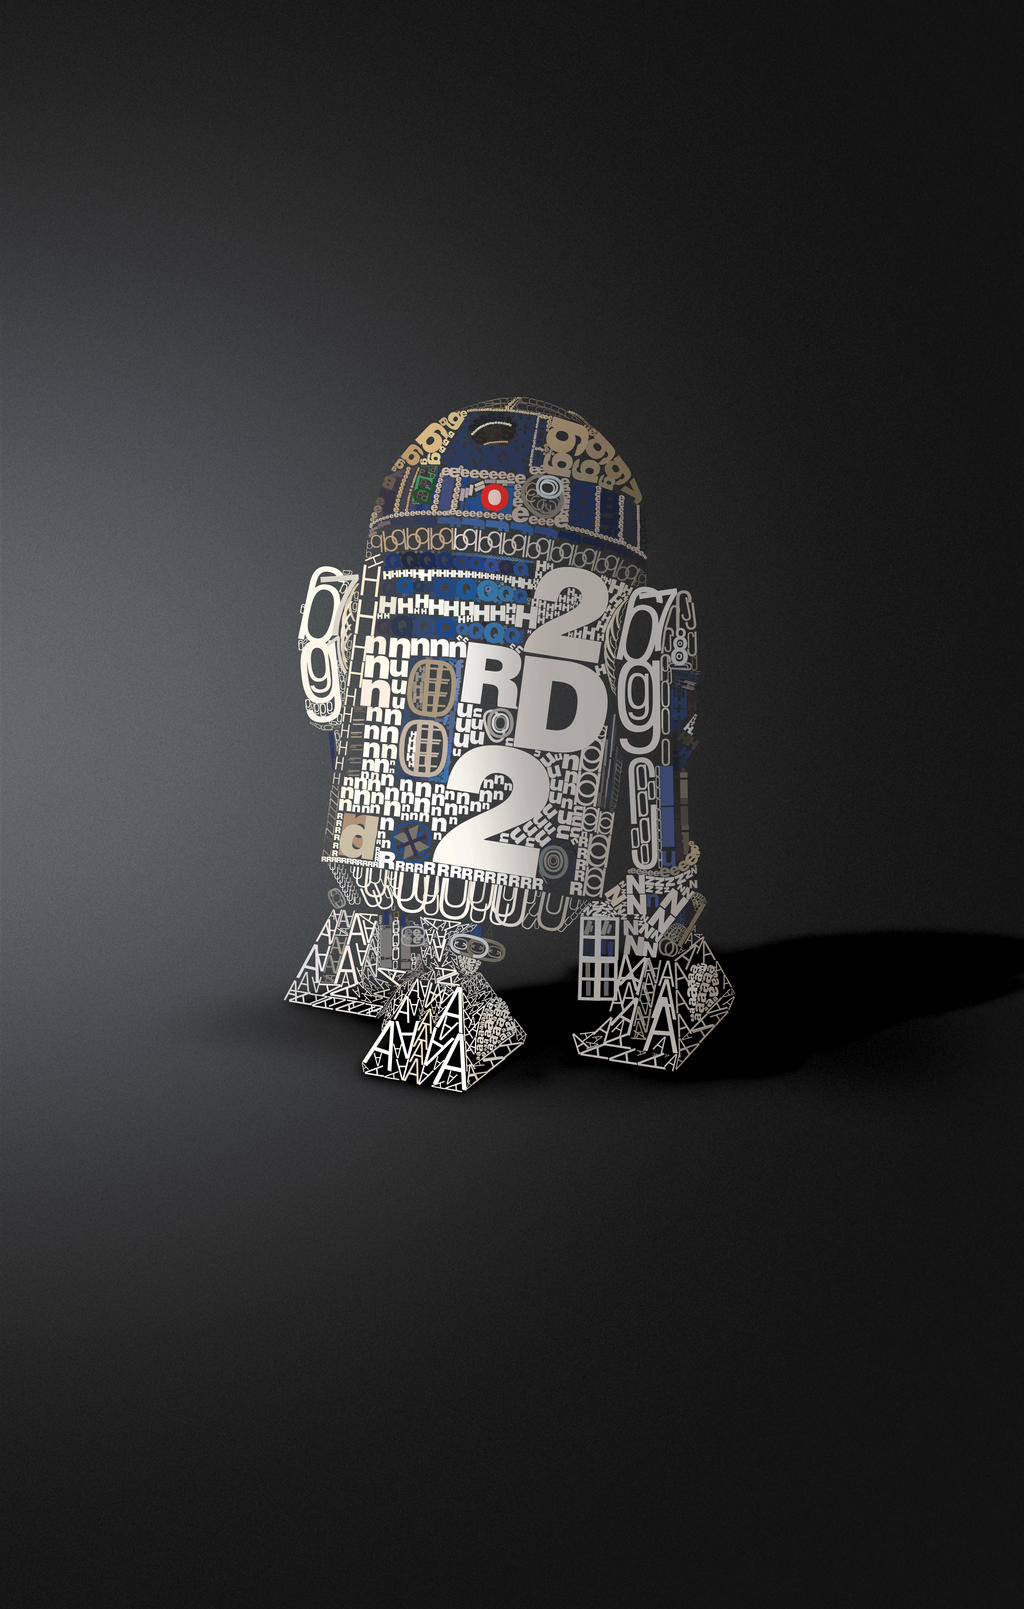 R2D2 in Helvetica by DavidBenoliel